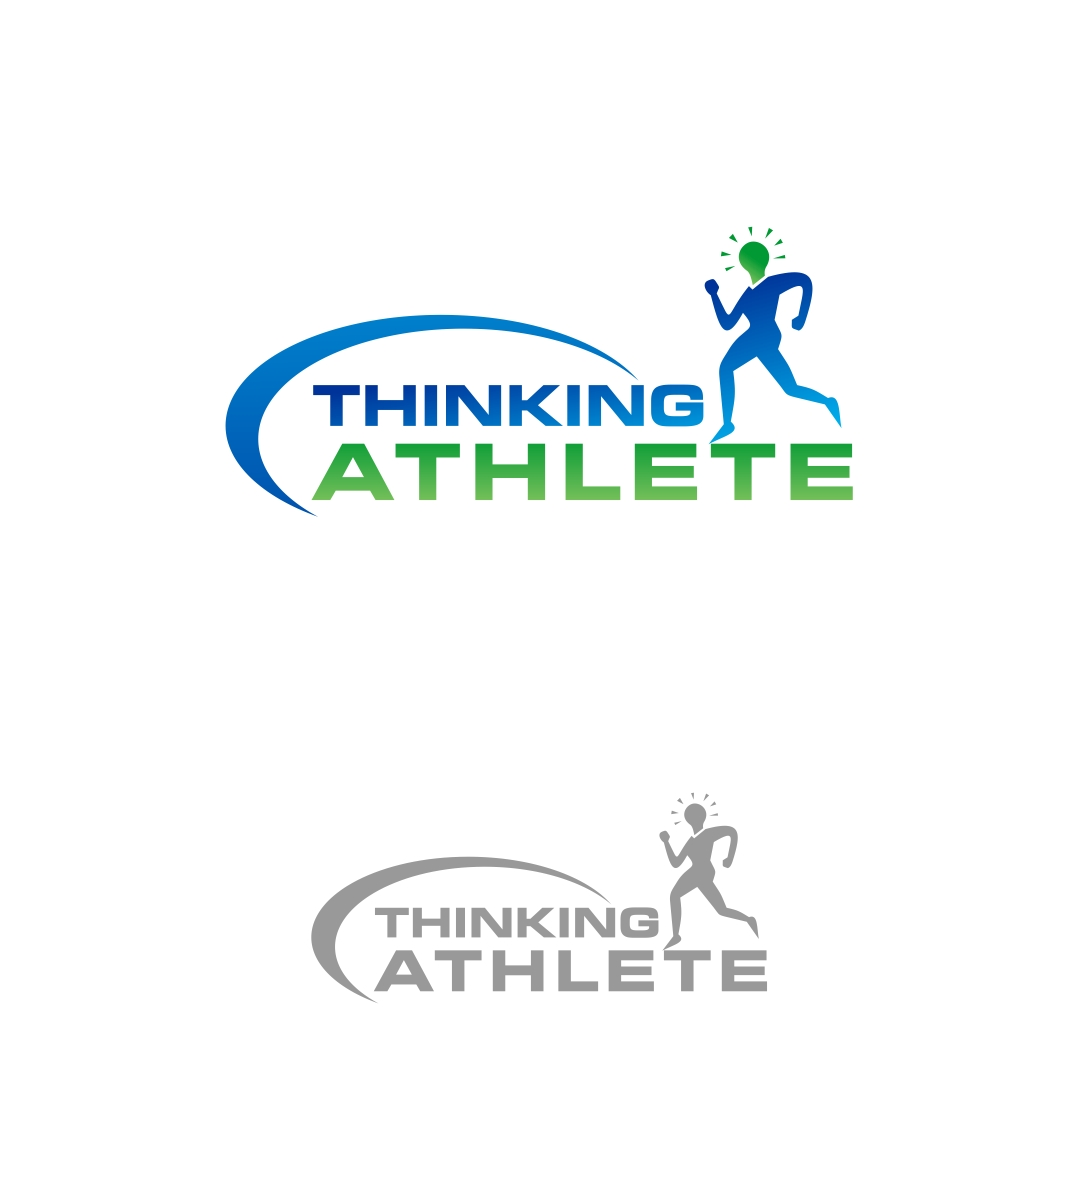 Logo Design by haidu - Entry No. 85 in the Logo Design Contest Thinking Athlete Logo Design.